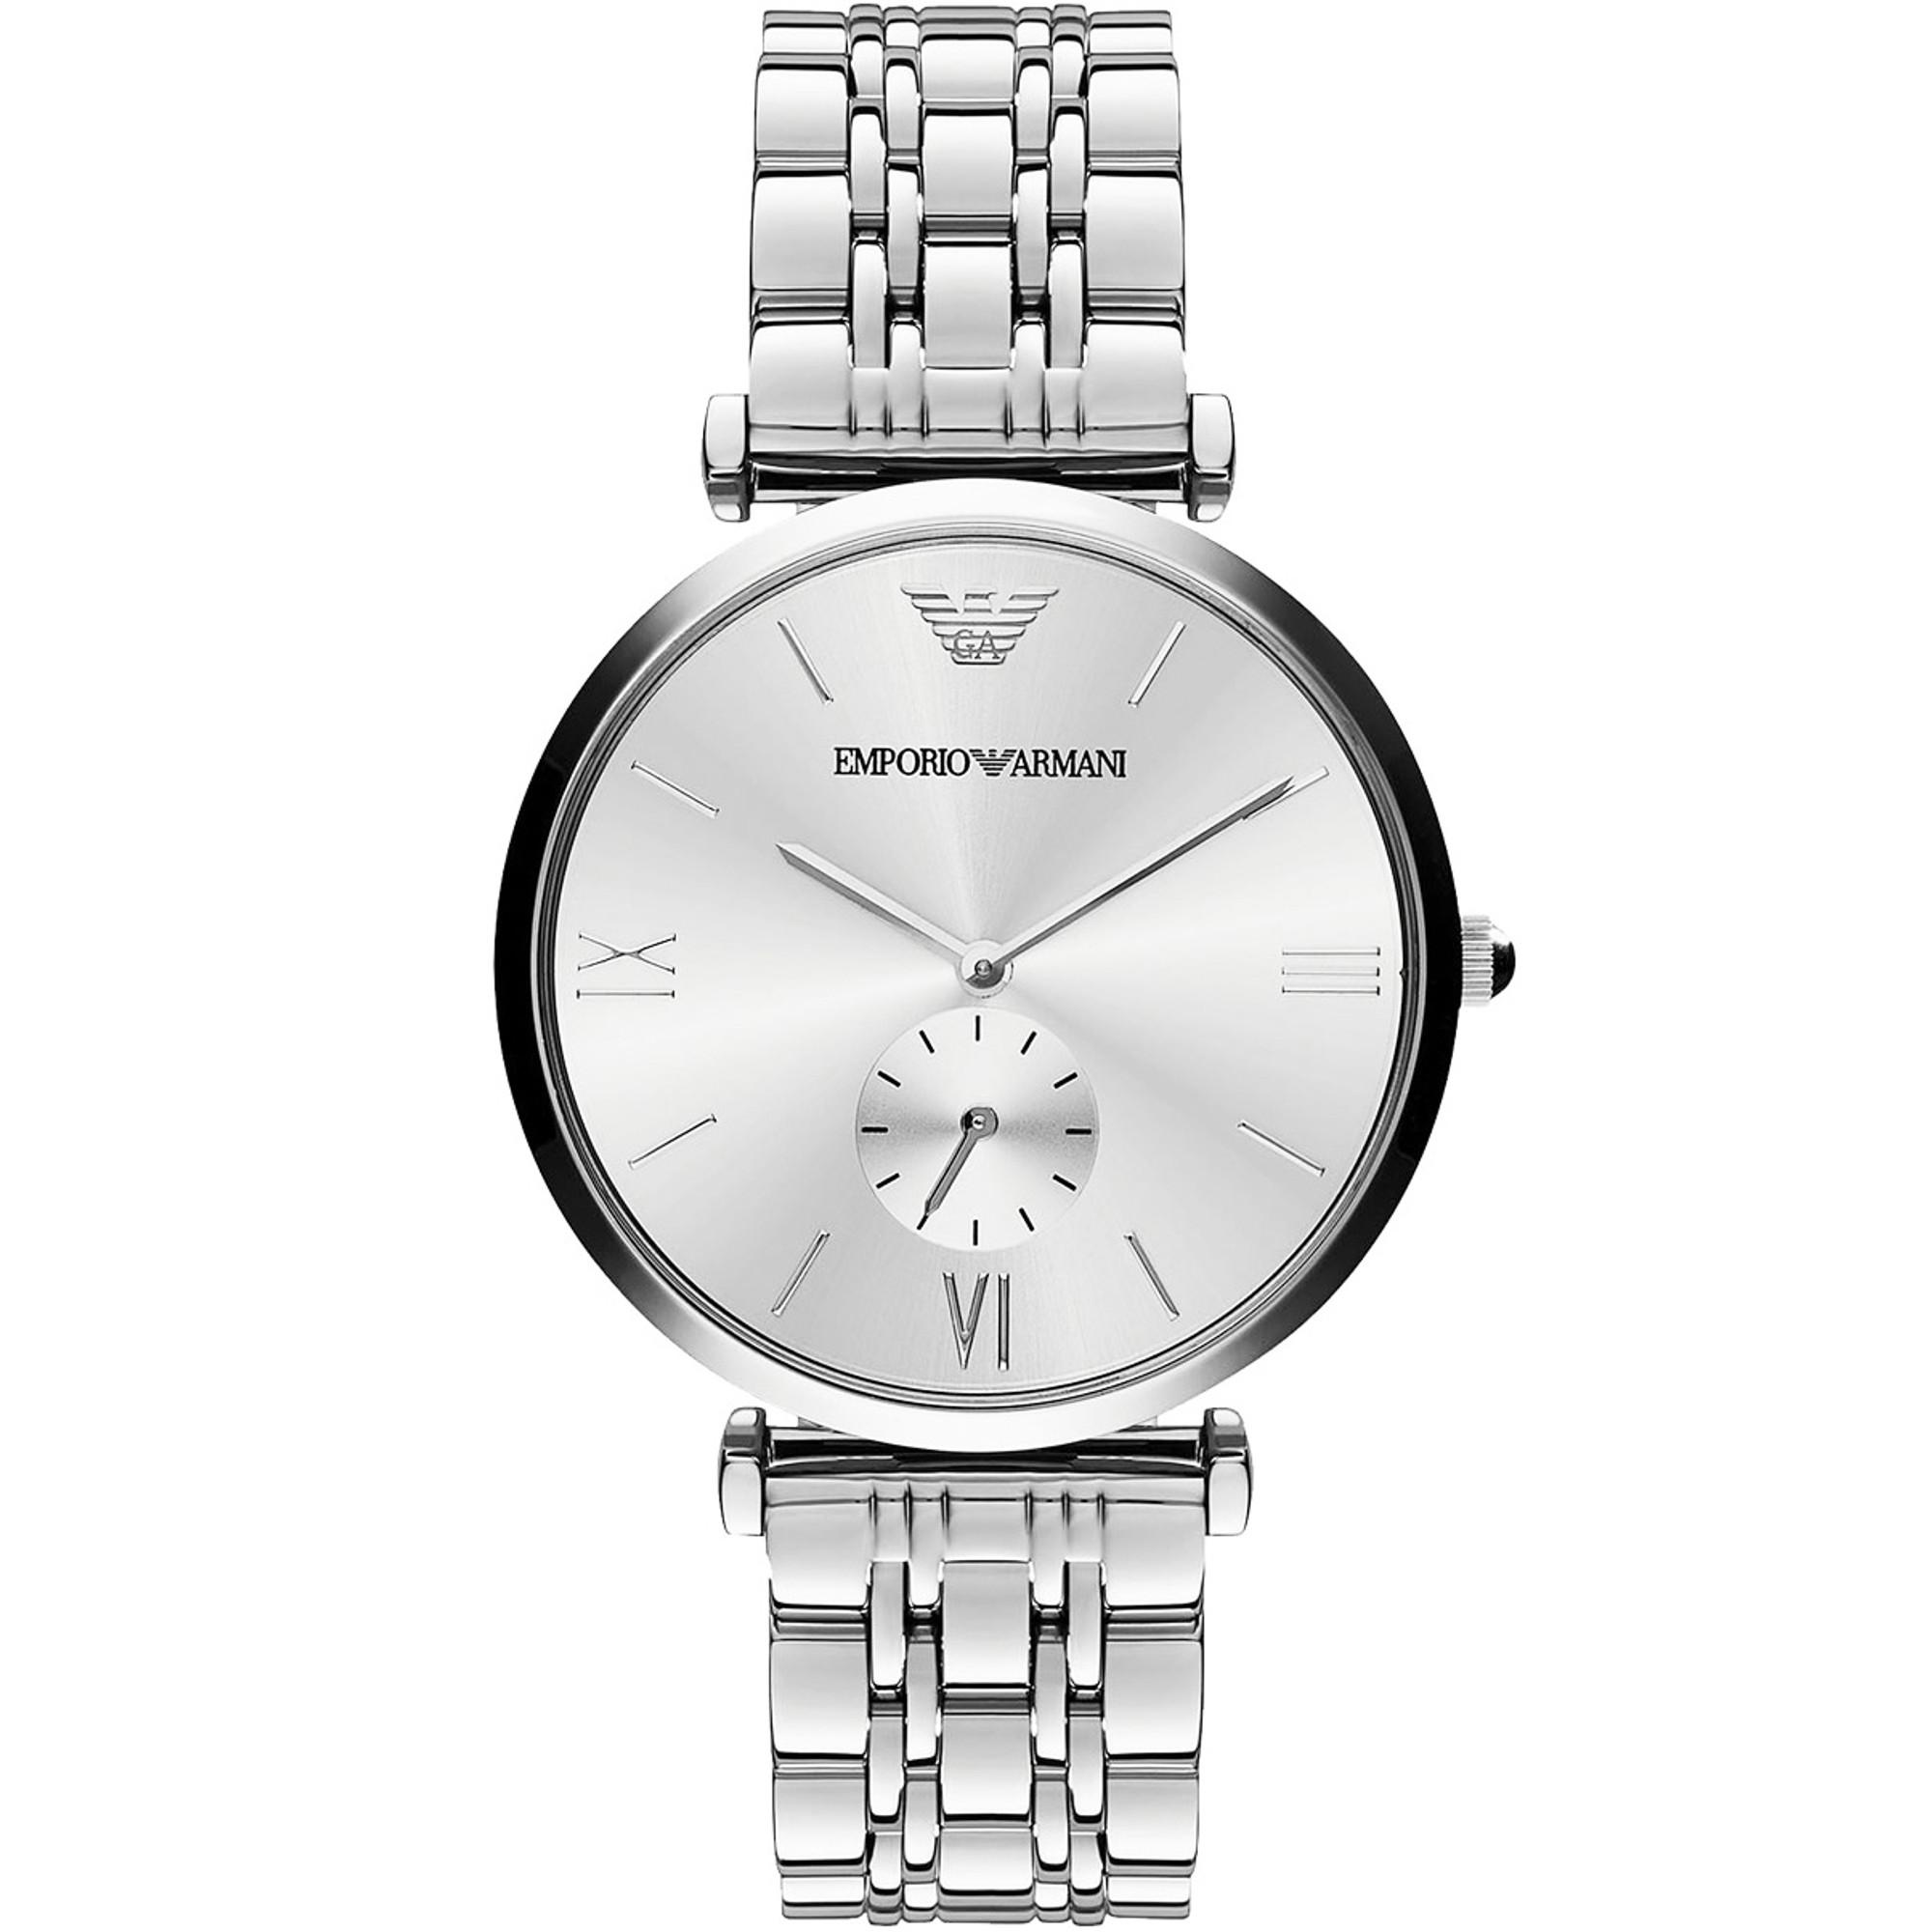 EMPORIO ARMANI Classic Watch AR1819